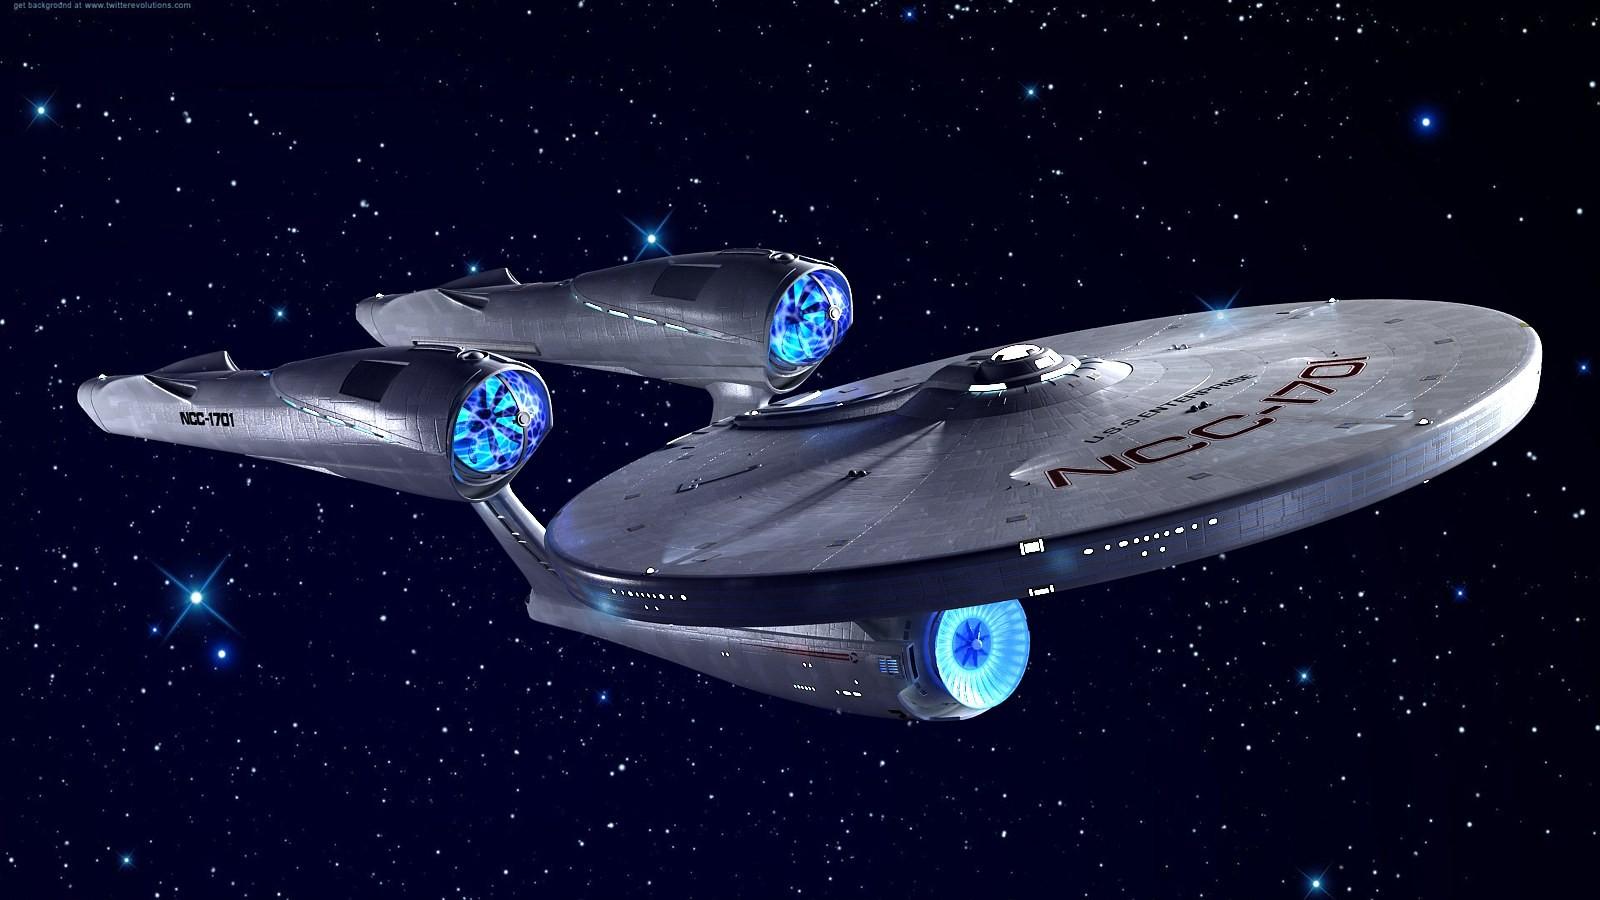 star-trek-enterprise-ncc-1701